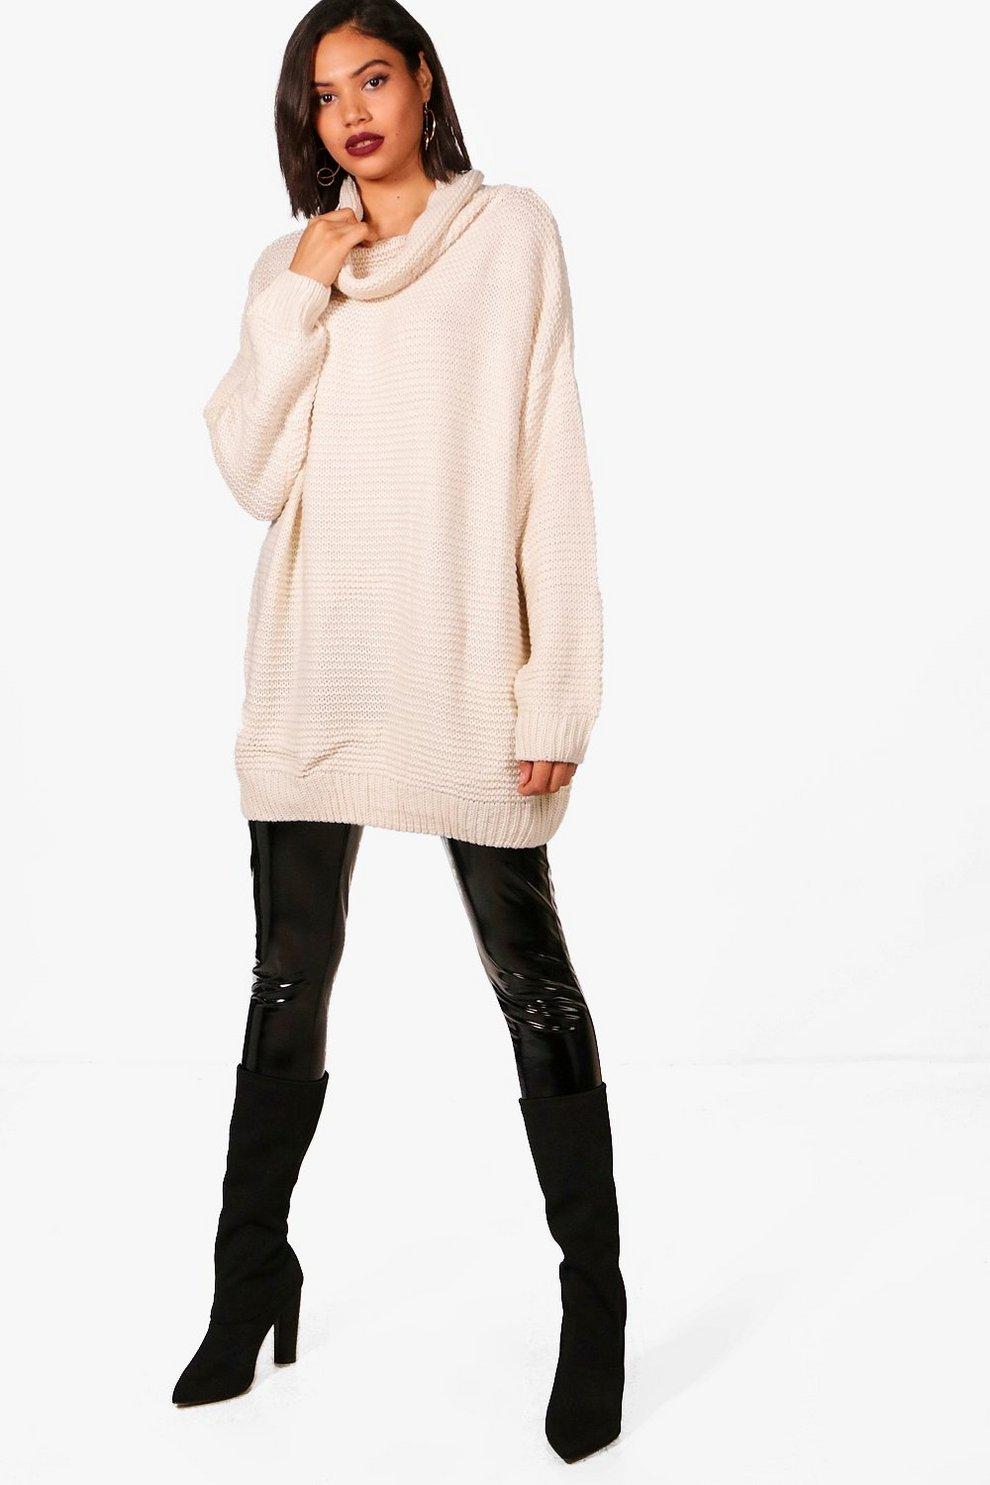 80ee1a3f0 Womens Beige Oversized Chunky Knit Roll Neck Jumper